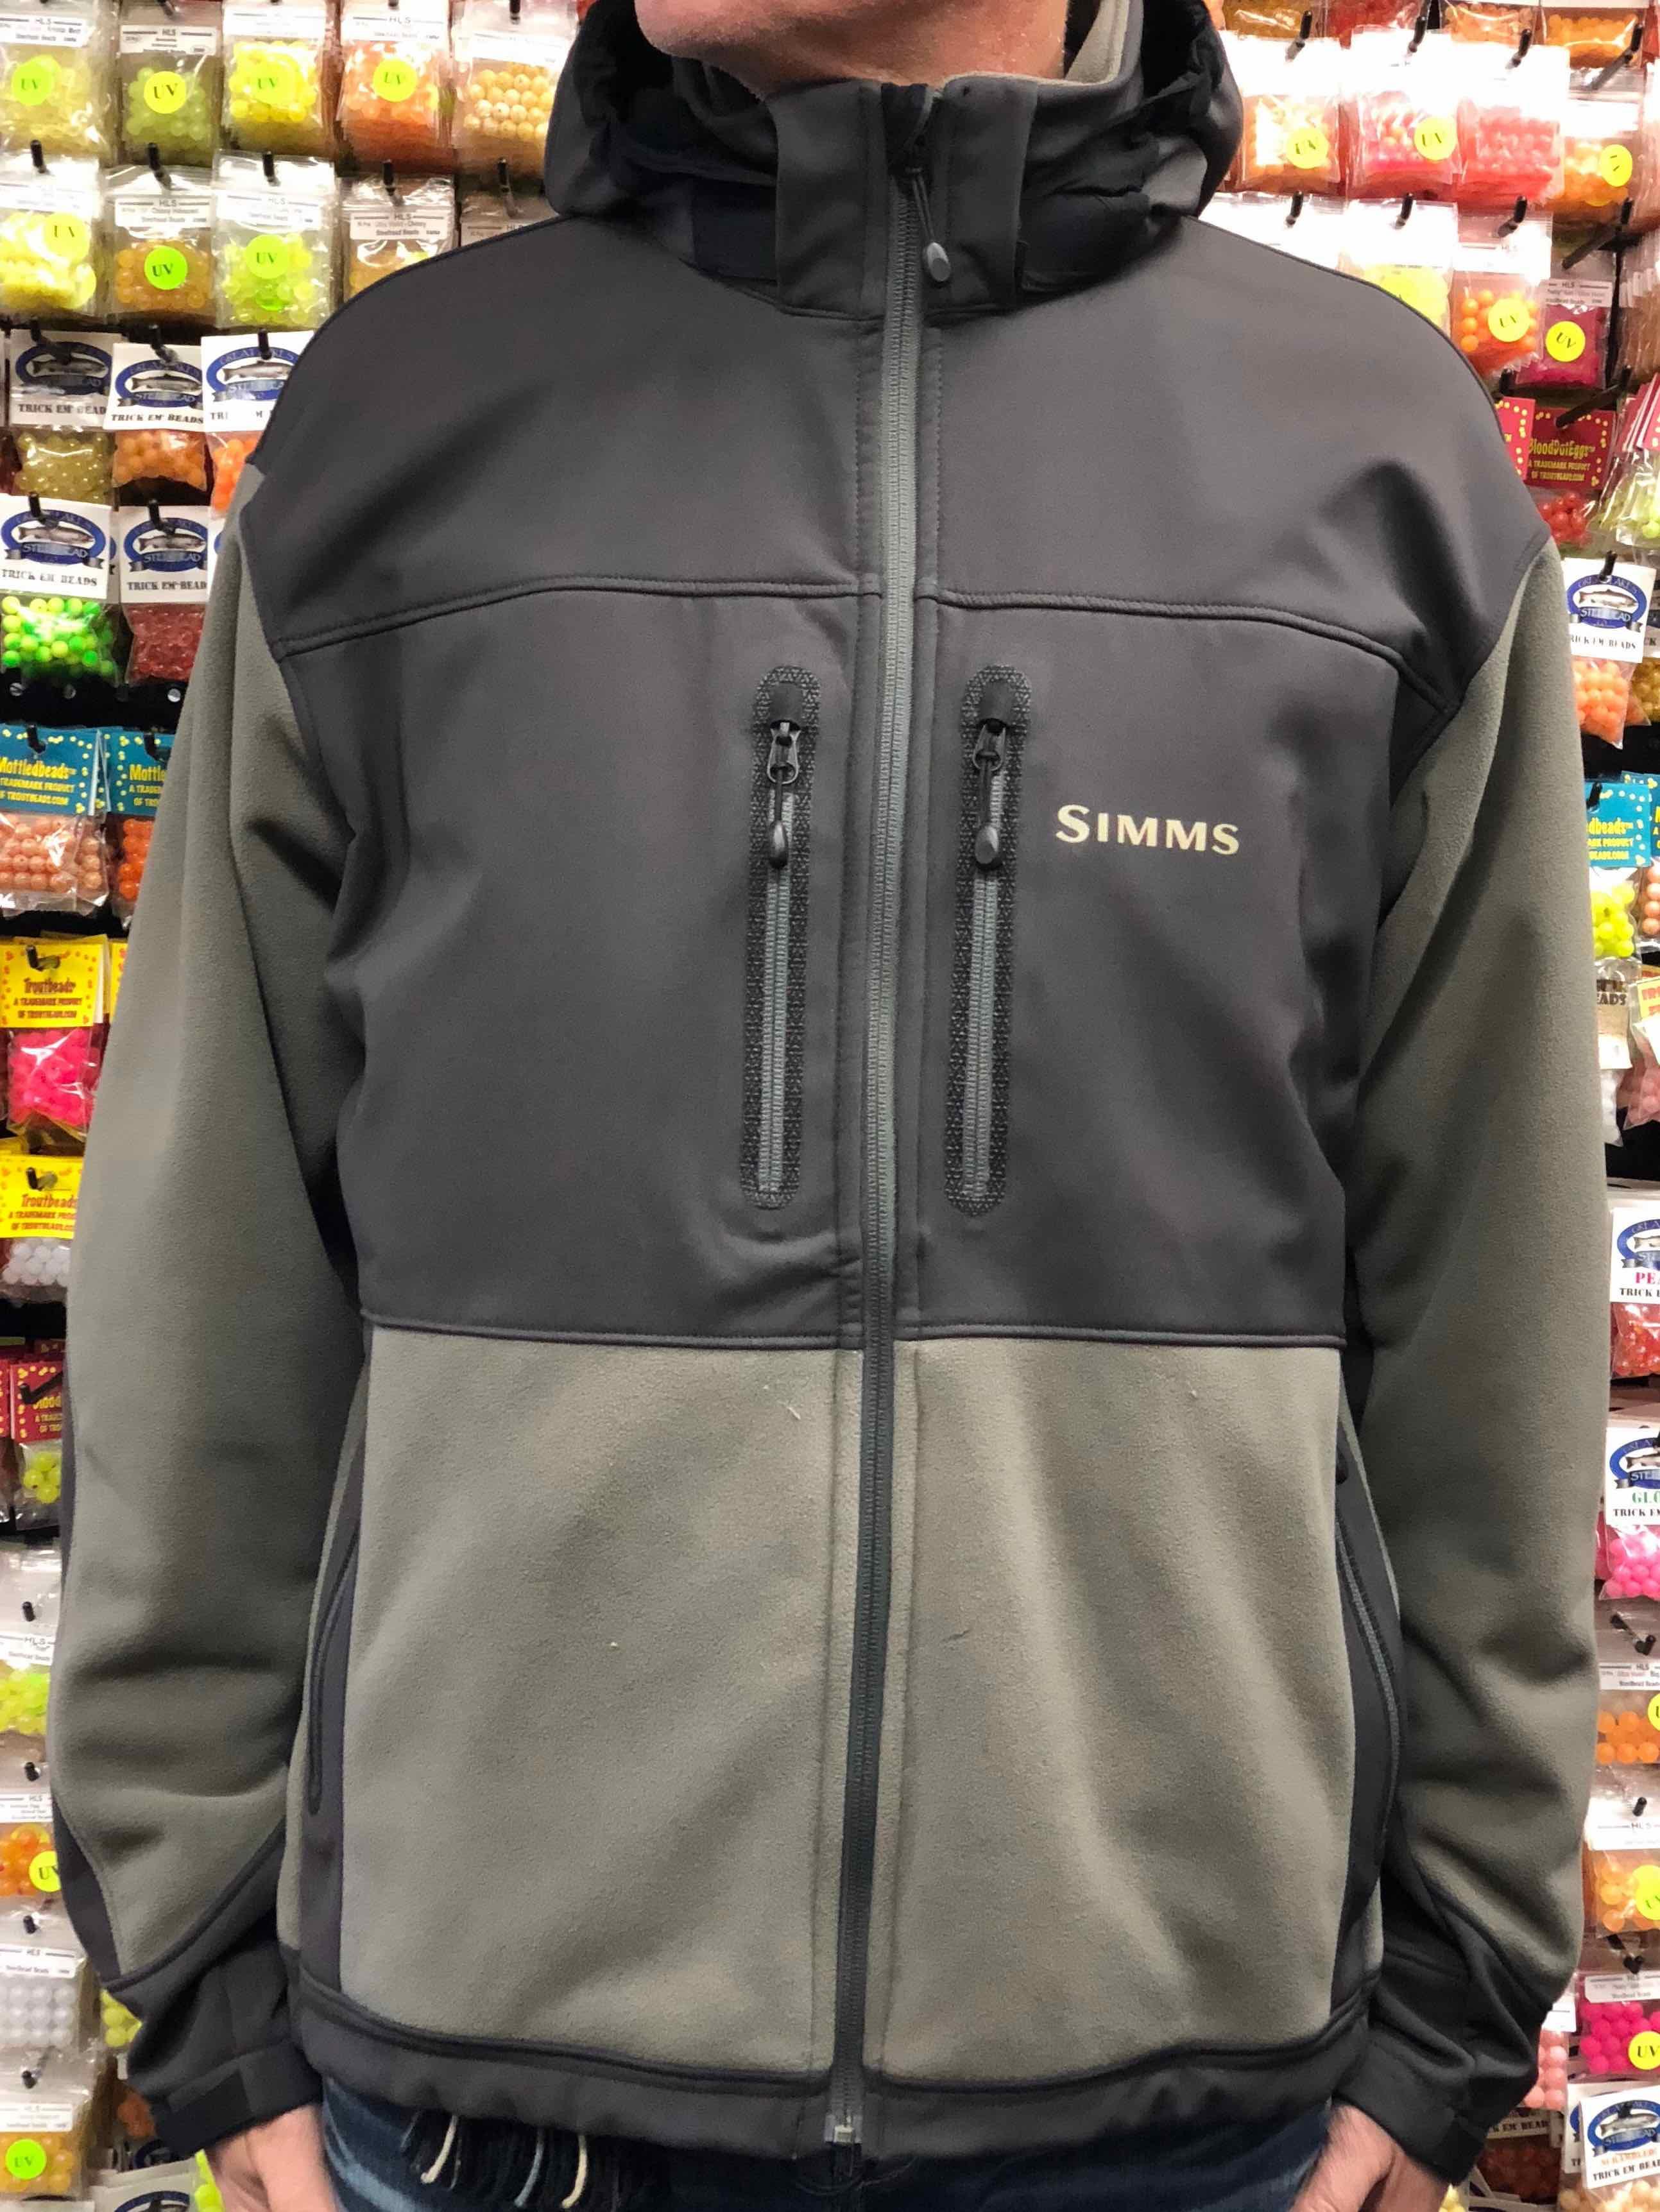 Simms Windstopper Soft Shell Jacket - LIKE NEW! - $75